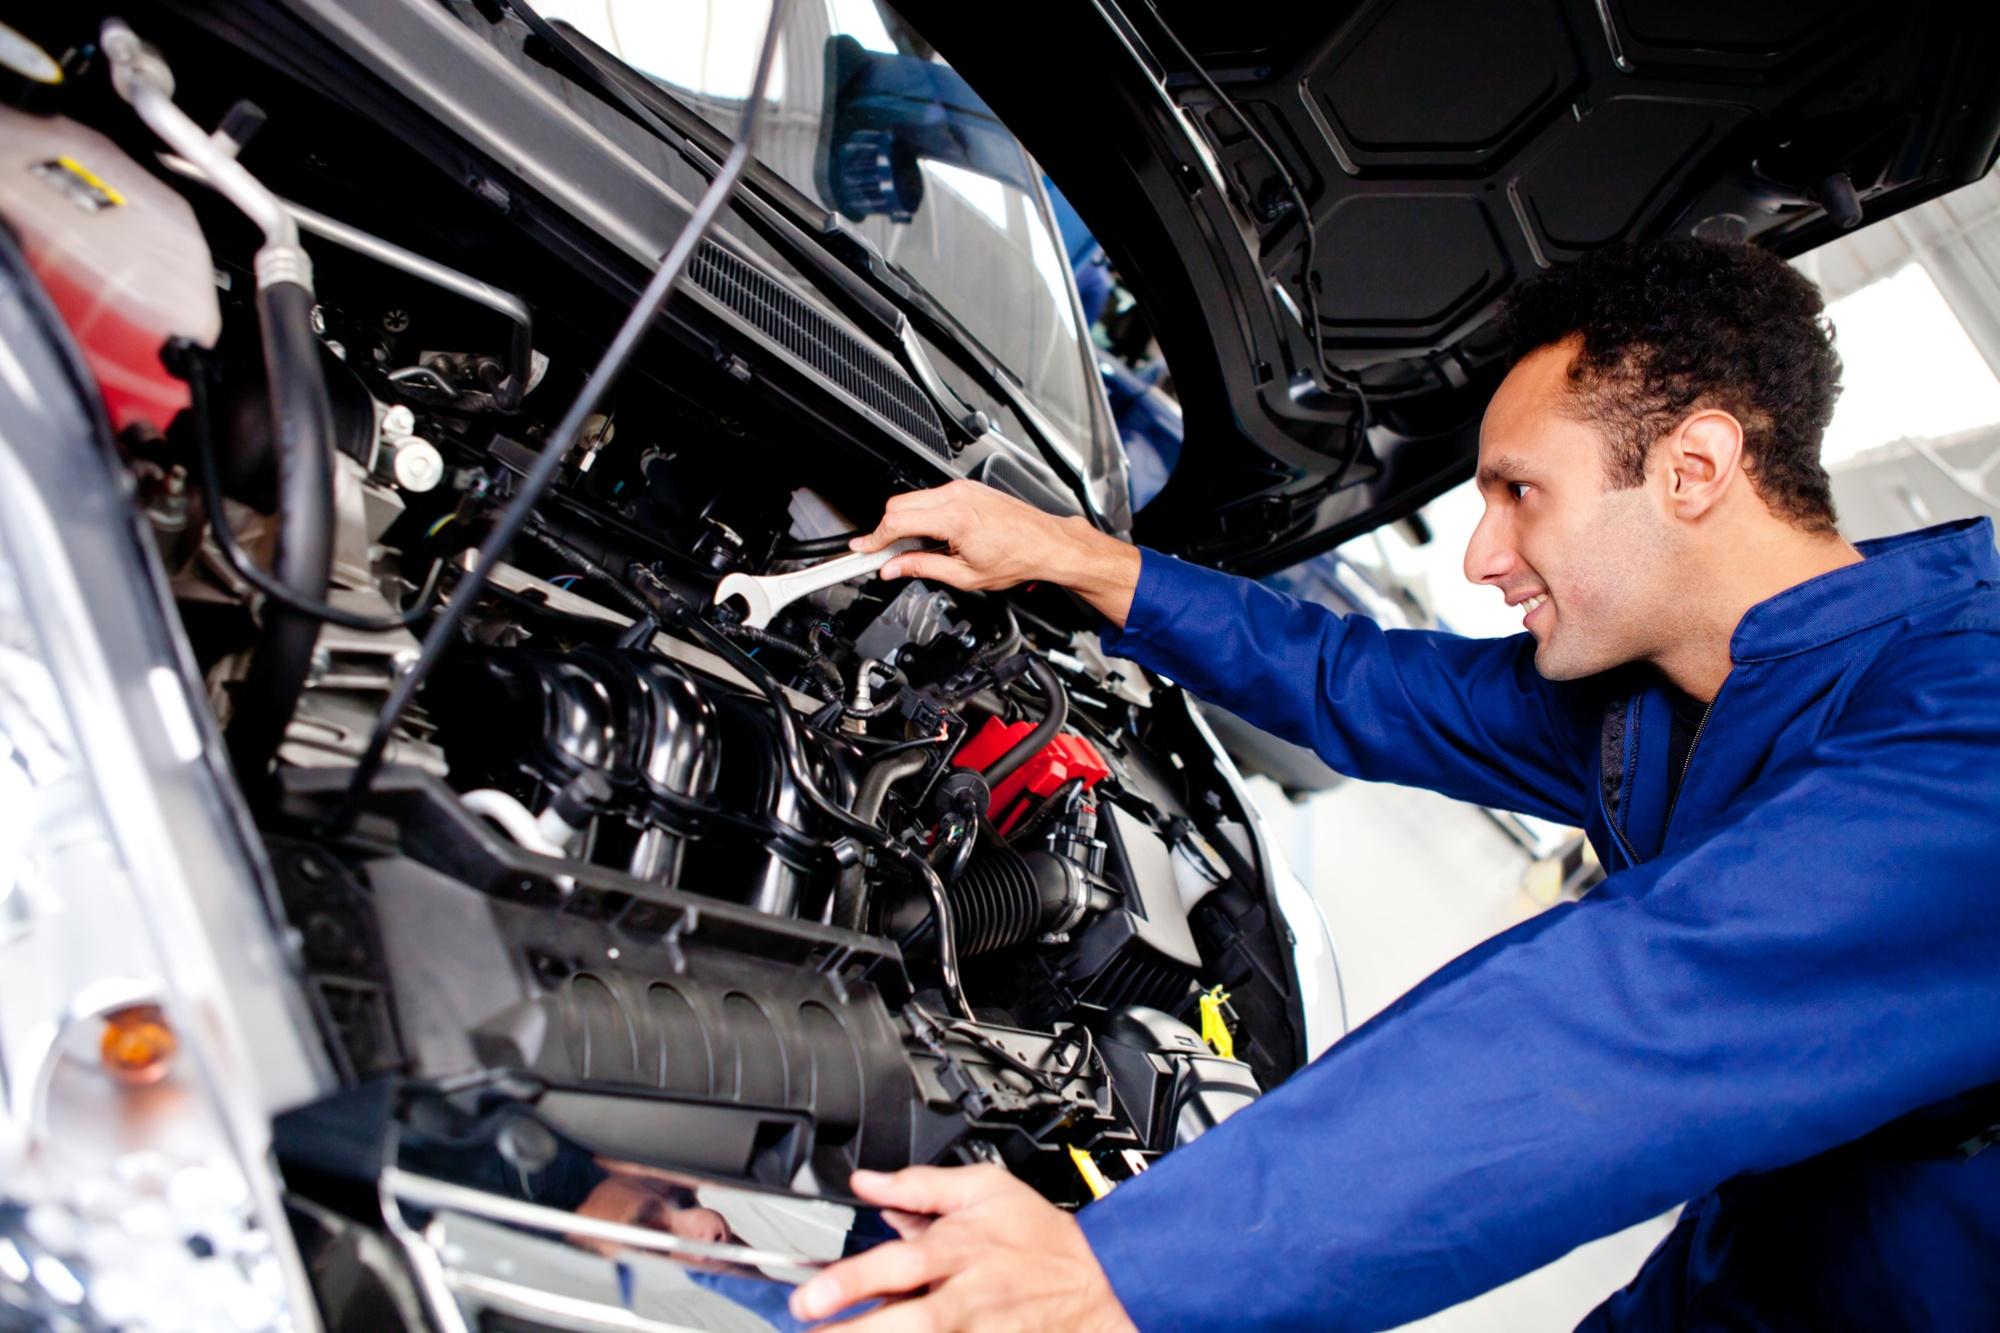 replacement window balances engine